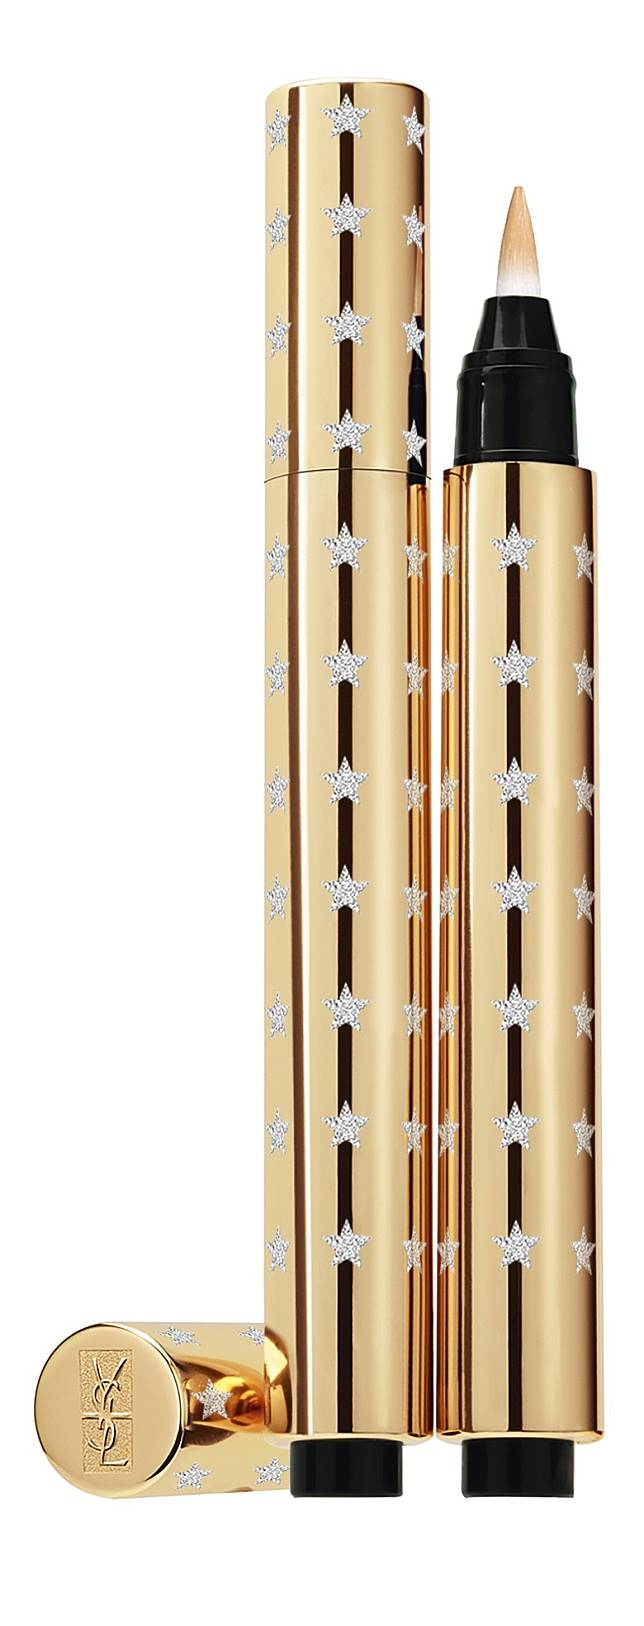 YSL Touche Eclat明彩筆:筆型設計能繪畫更細致部位,經典的金色外殼配上閃爍繁星,賣相高貴吸引,加上備有兩色選擇,適合不同膚色人士使用。(互聯網)